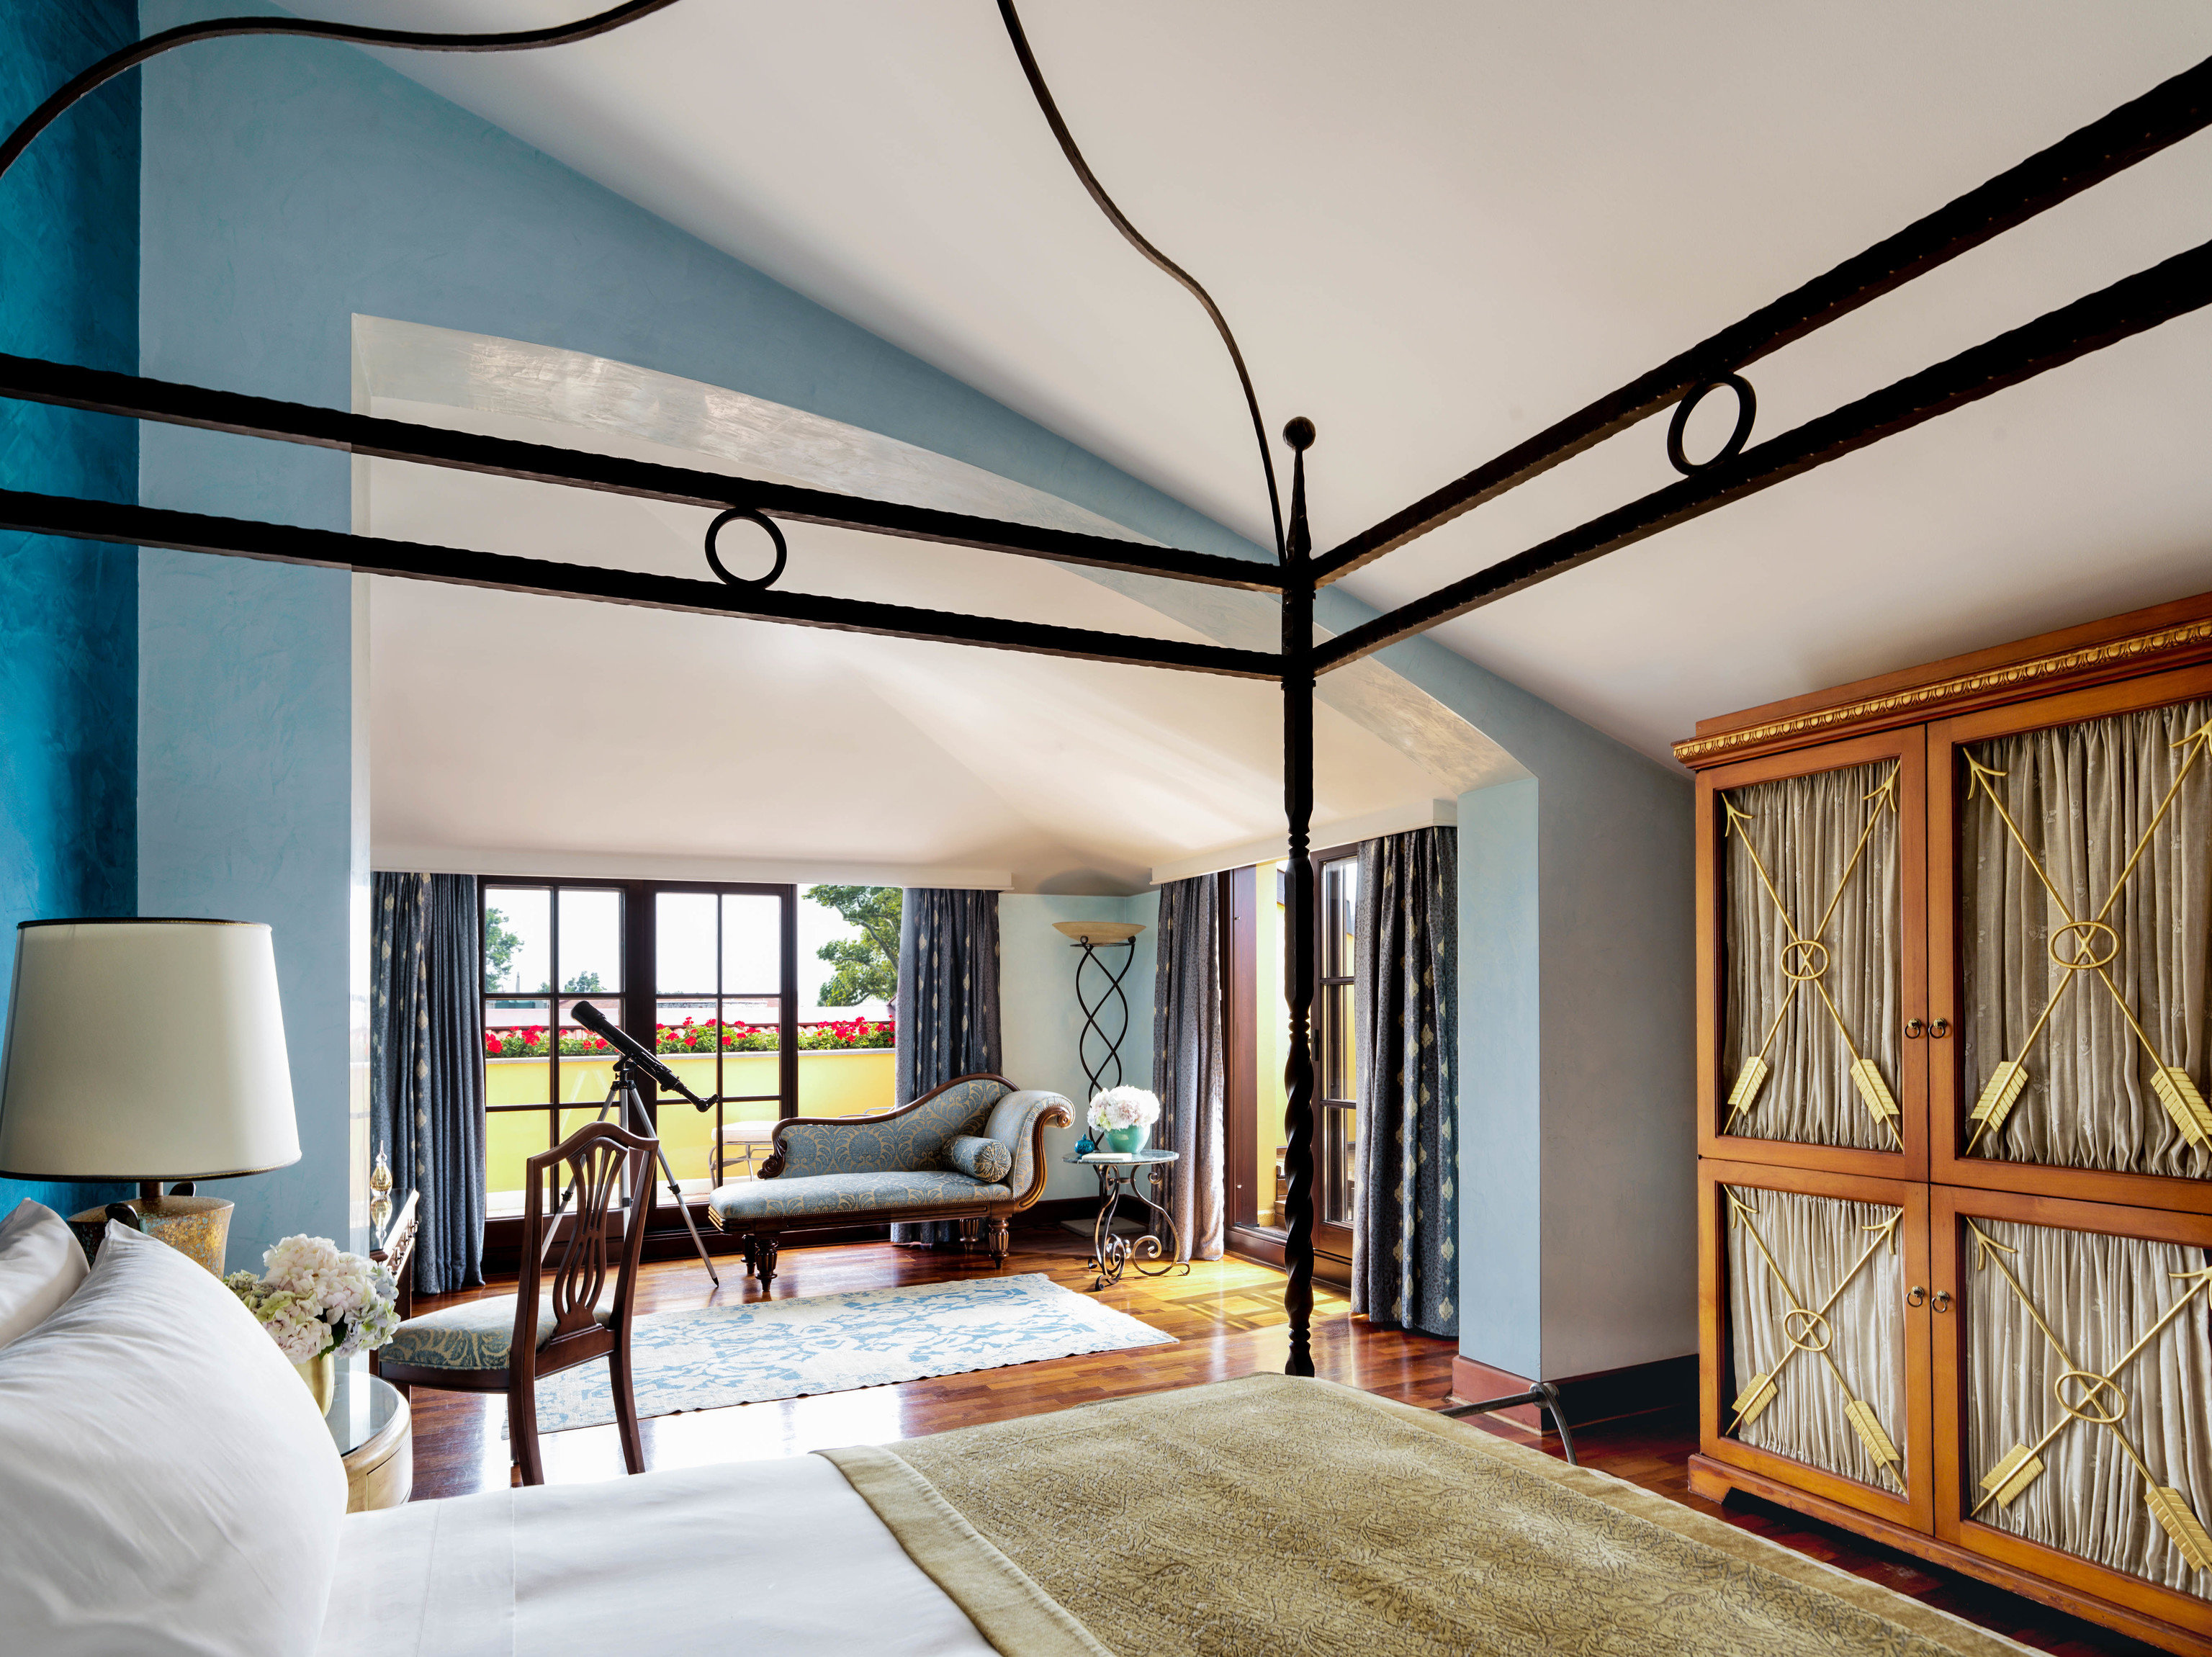 Boutique Hotels Hotels Luxury Travel indoor wall room ceiling bed interior design real estate estate living room home window Bedroom house interior designer furniture